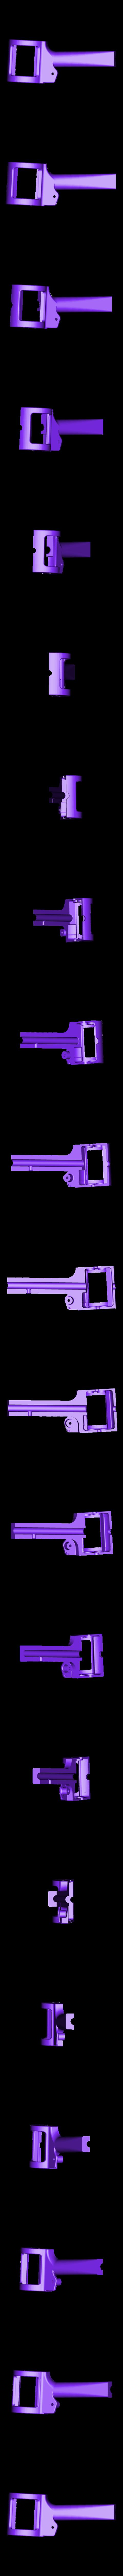 arm front3 (1pcs).STL Download STL file Folding Quadcopter 450 Frame • 3D print object, AleksandrDolzhenko